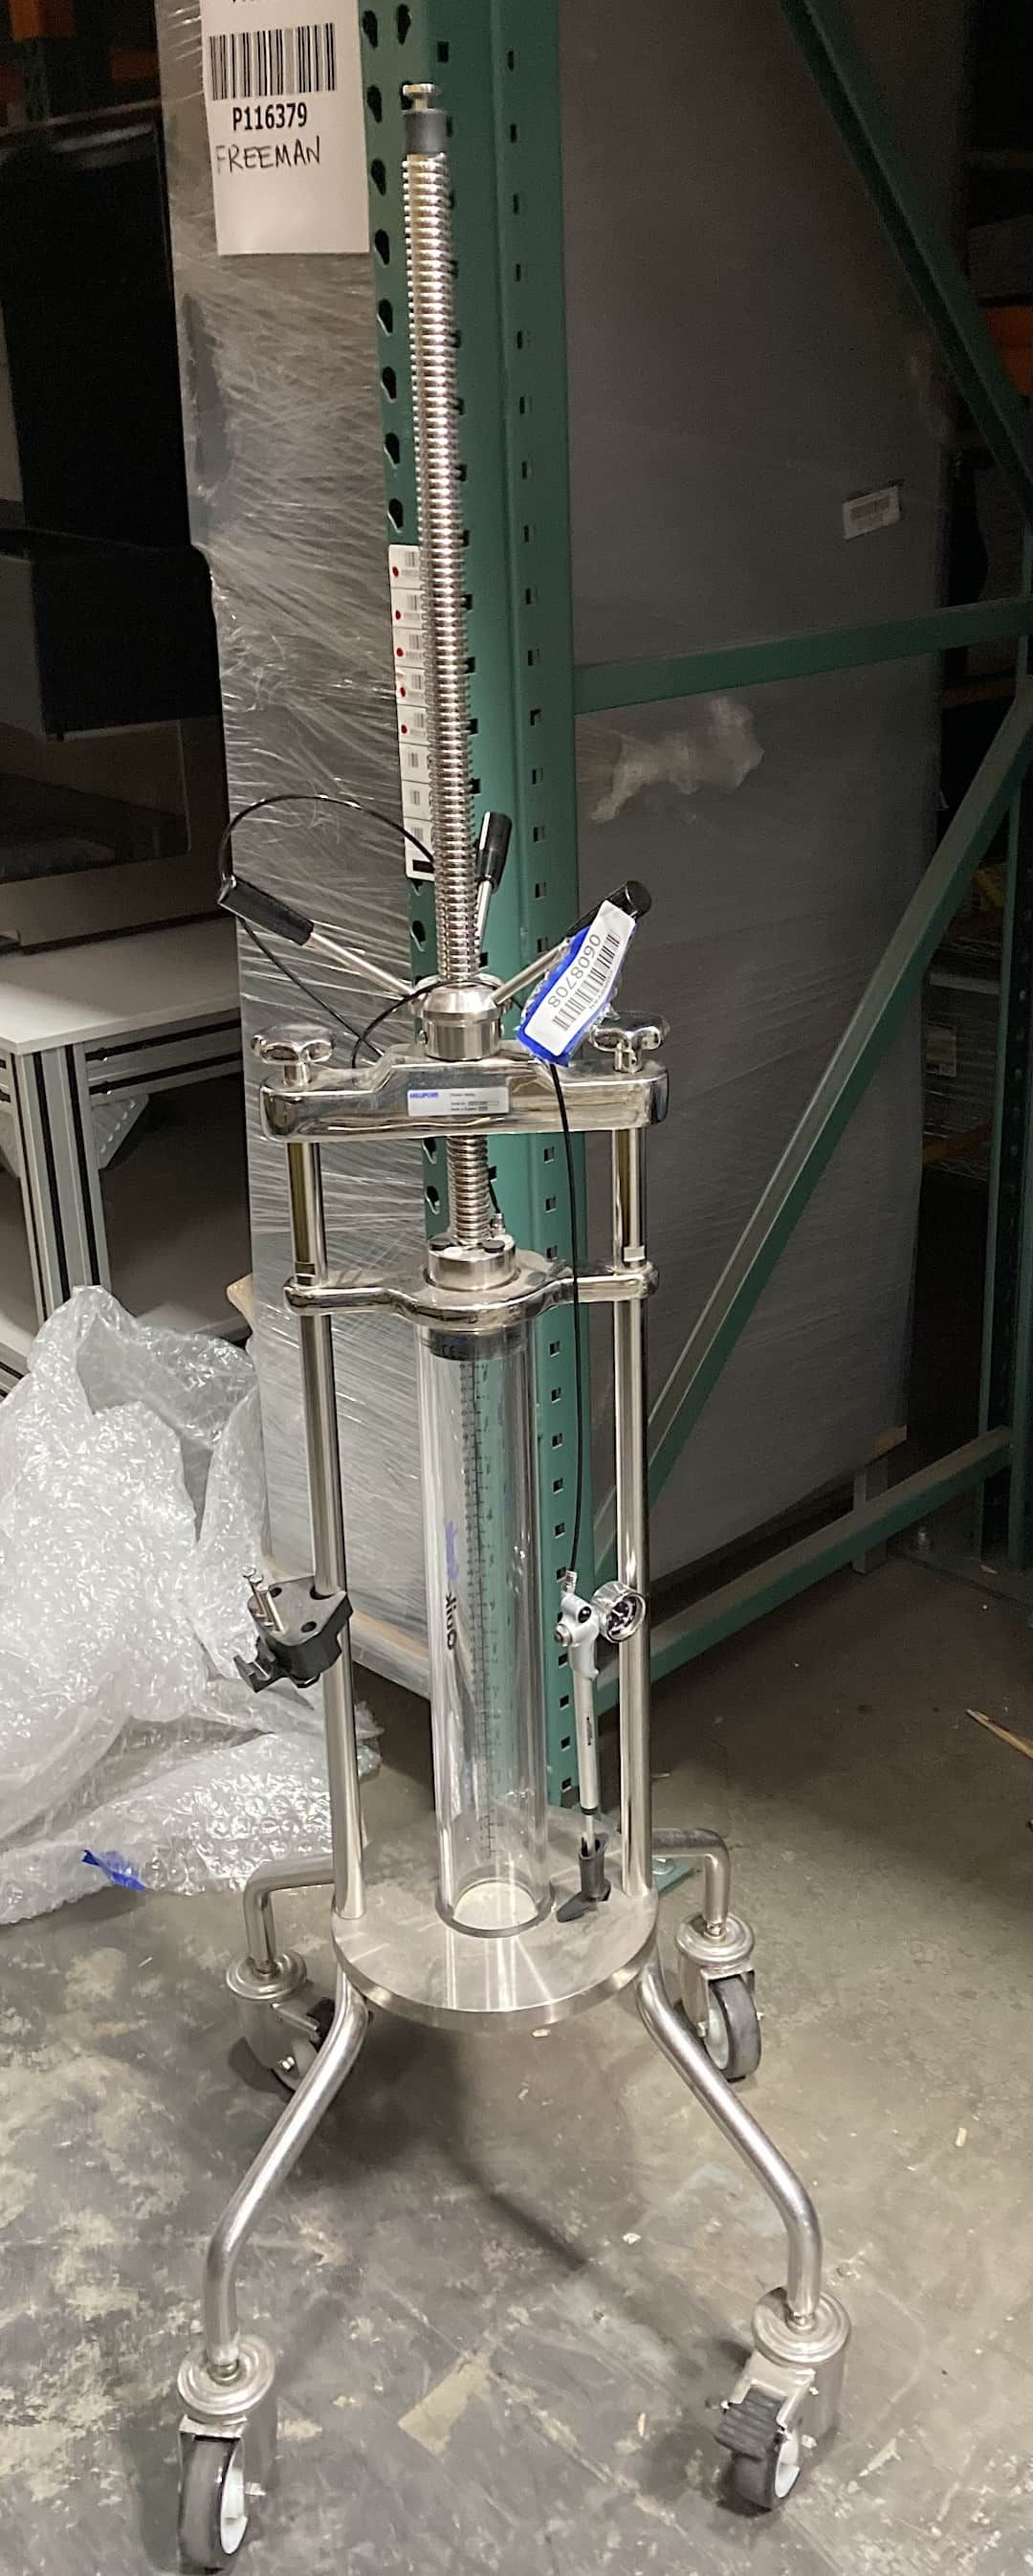 Millipore Quickscale 70cm x 550cm Biochromatography Column